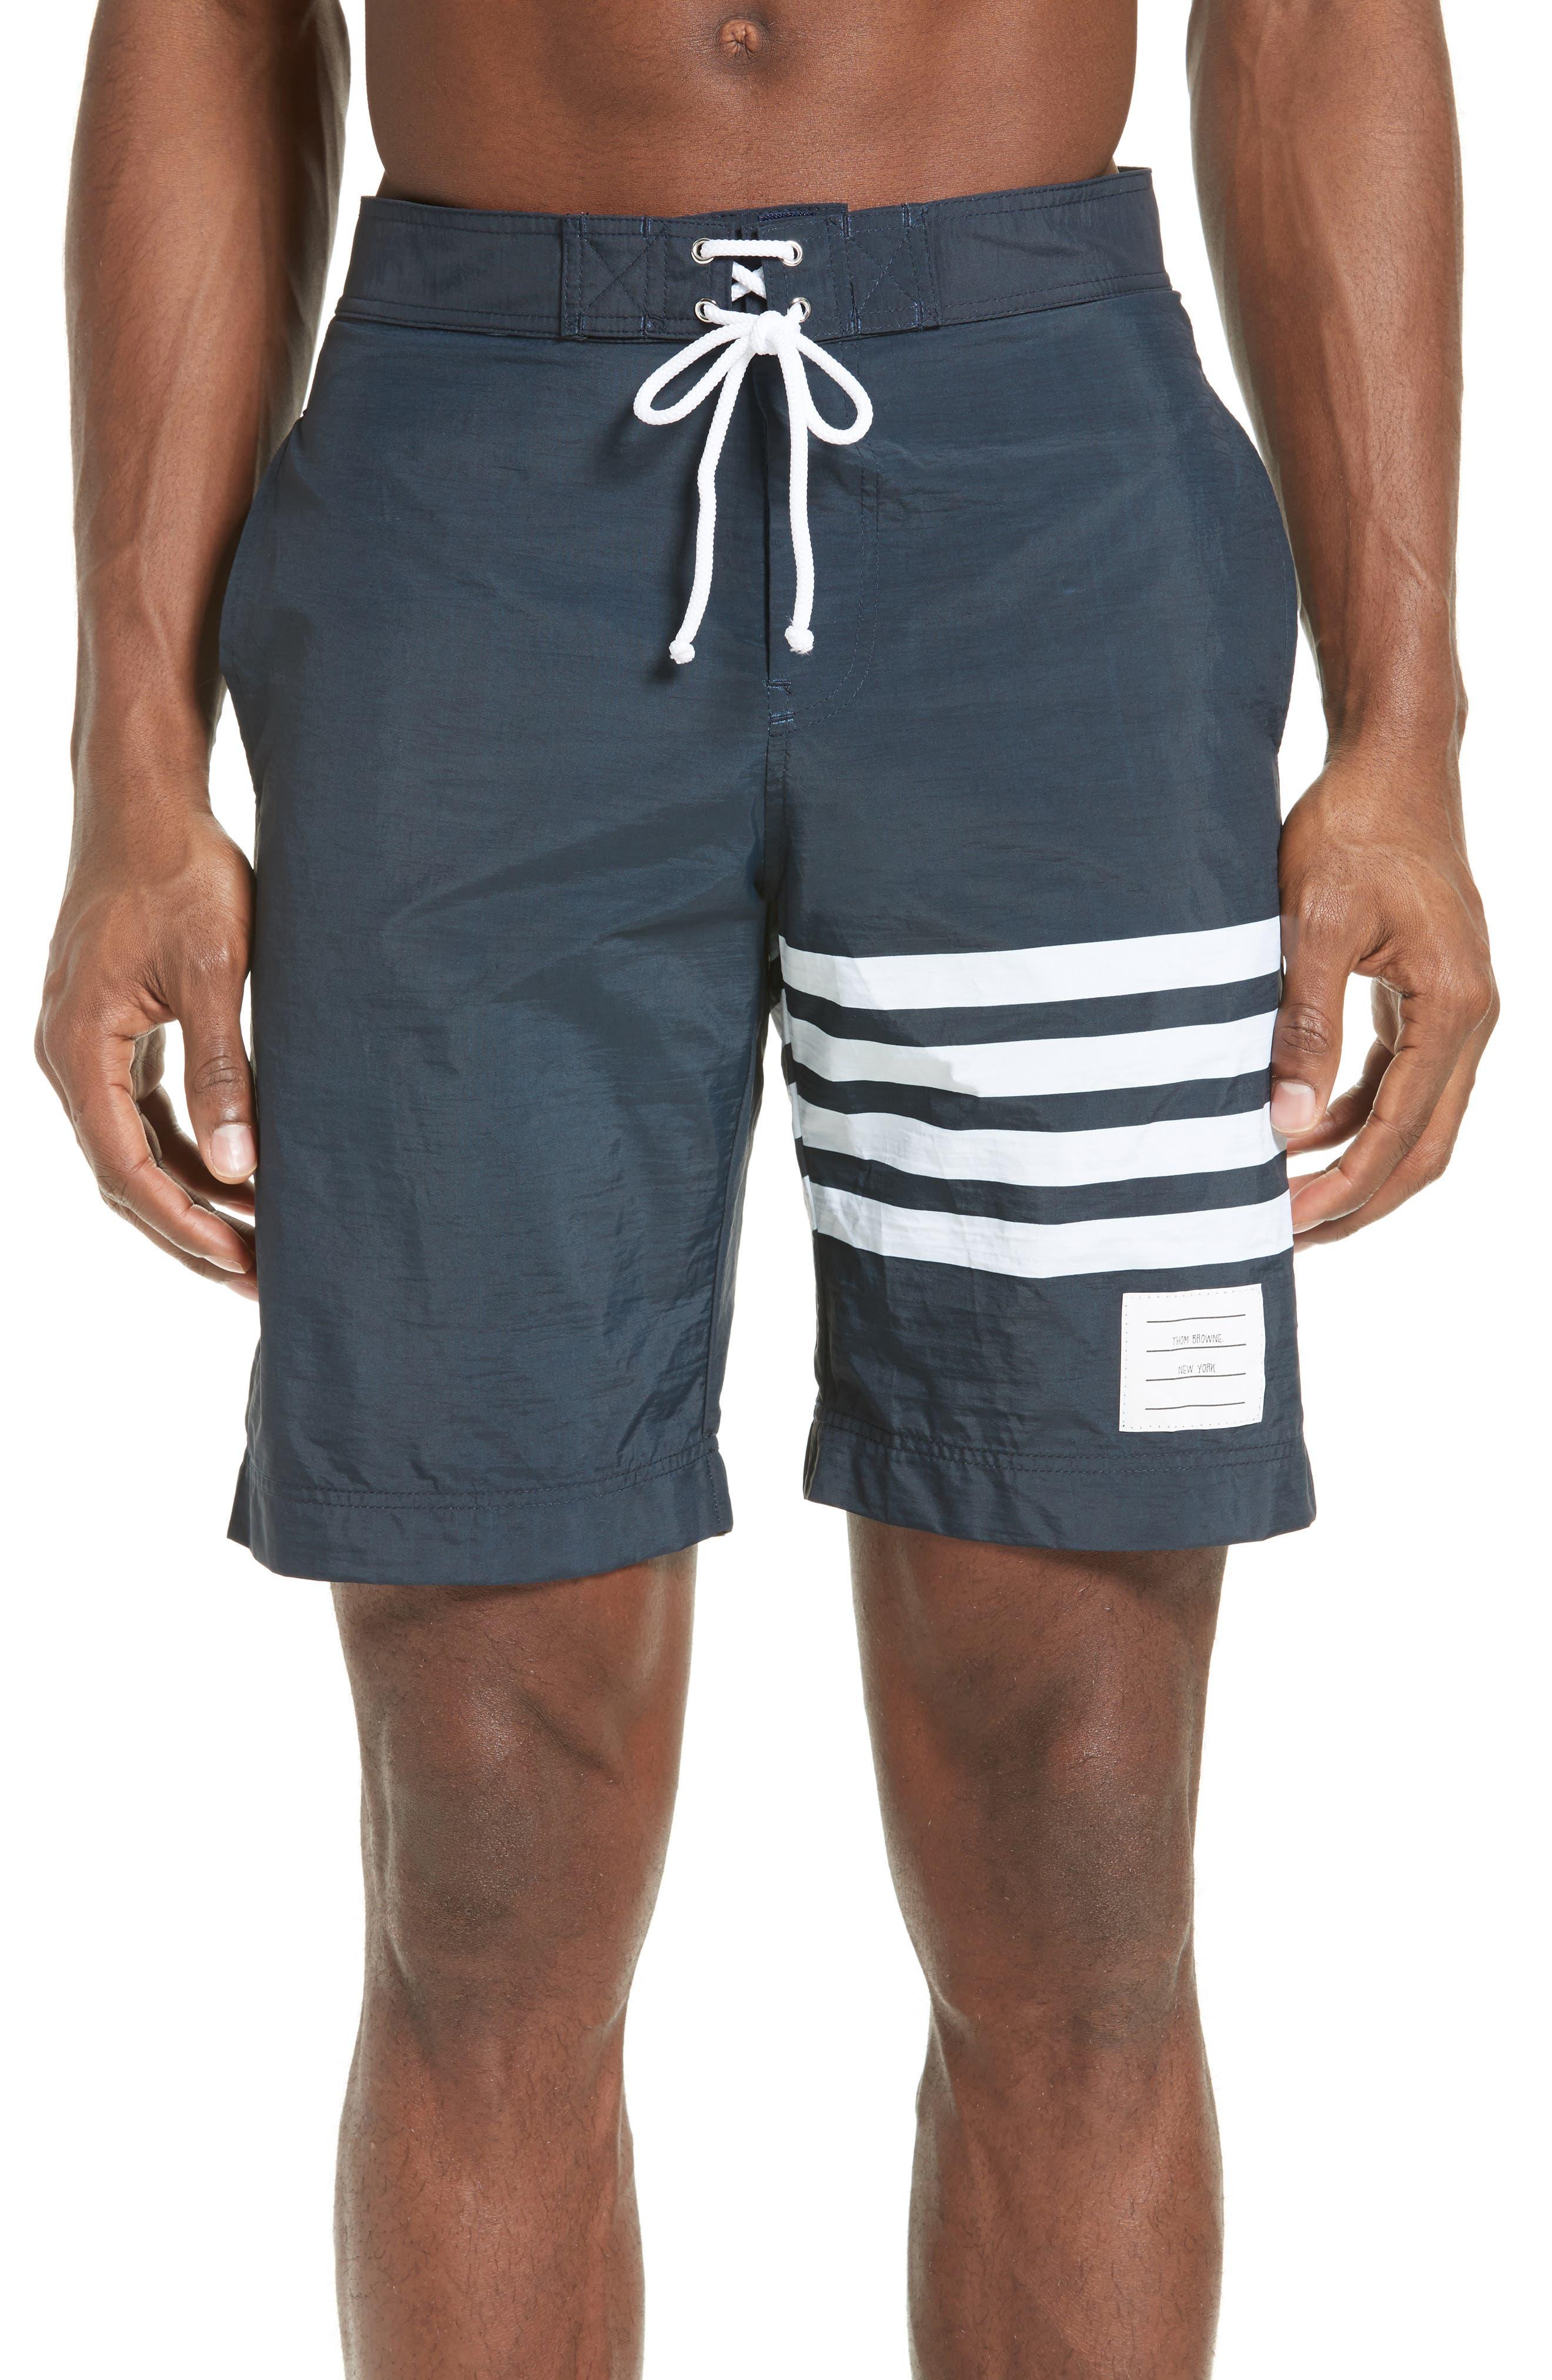 Thom Browne 4-Bar Print Tech Board Shorts